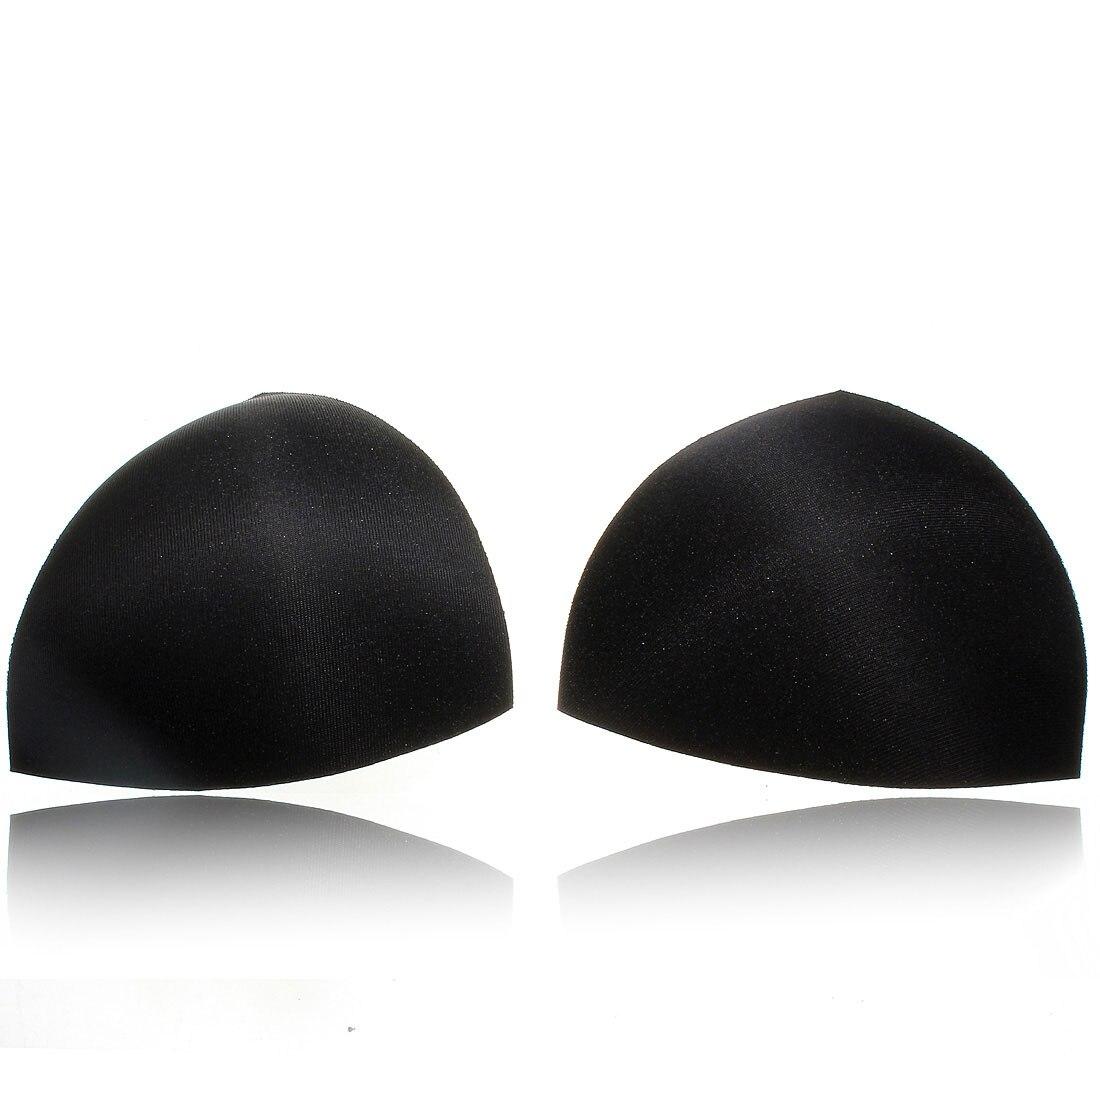 1 Pair Womens Sponge Gel Bra Inserts Pads Breast Enhancer Intimates Padded Bras Underwear White Black Nude Color 3